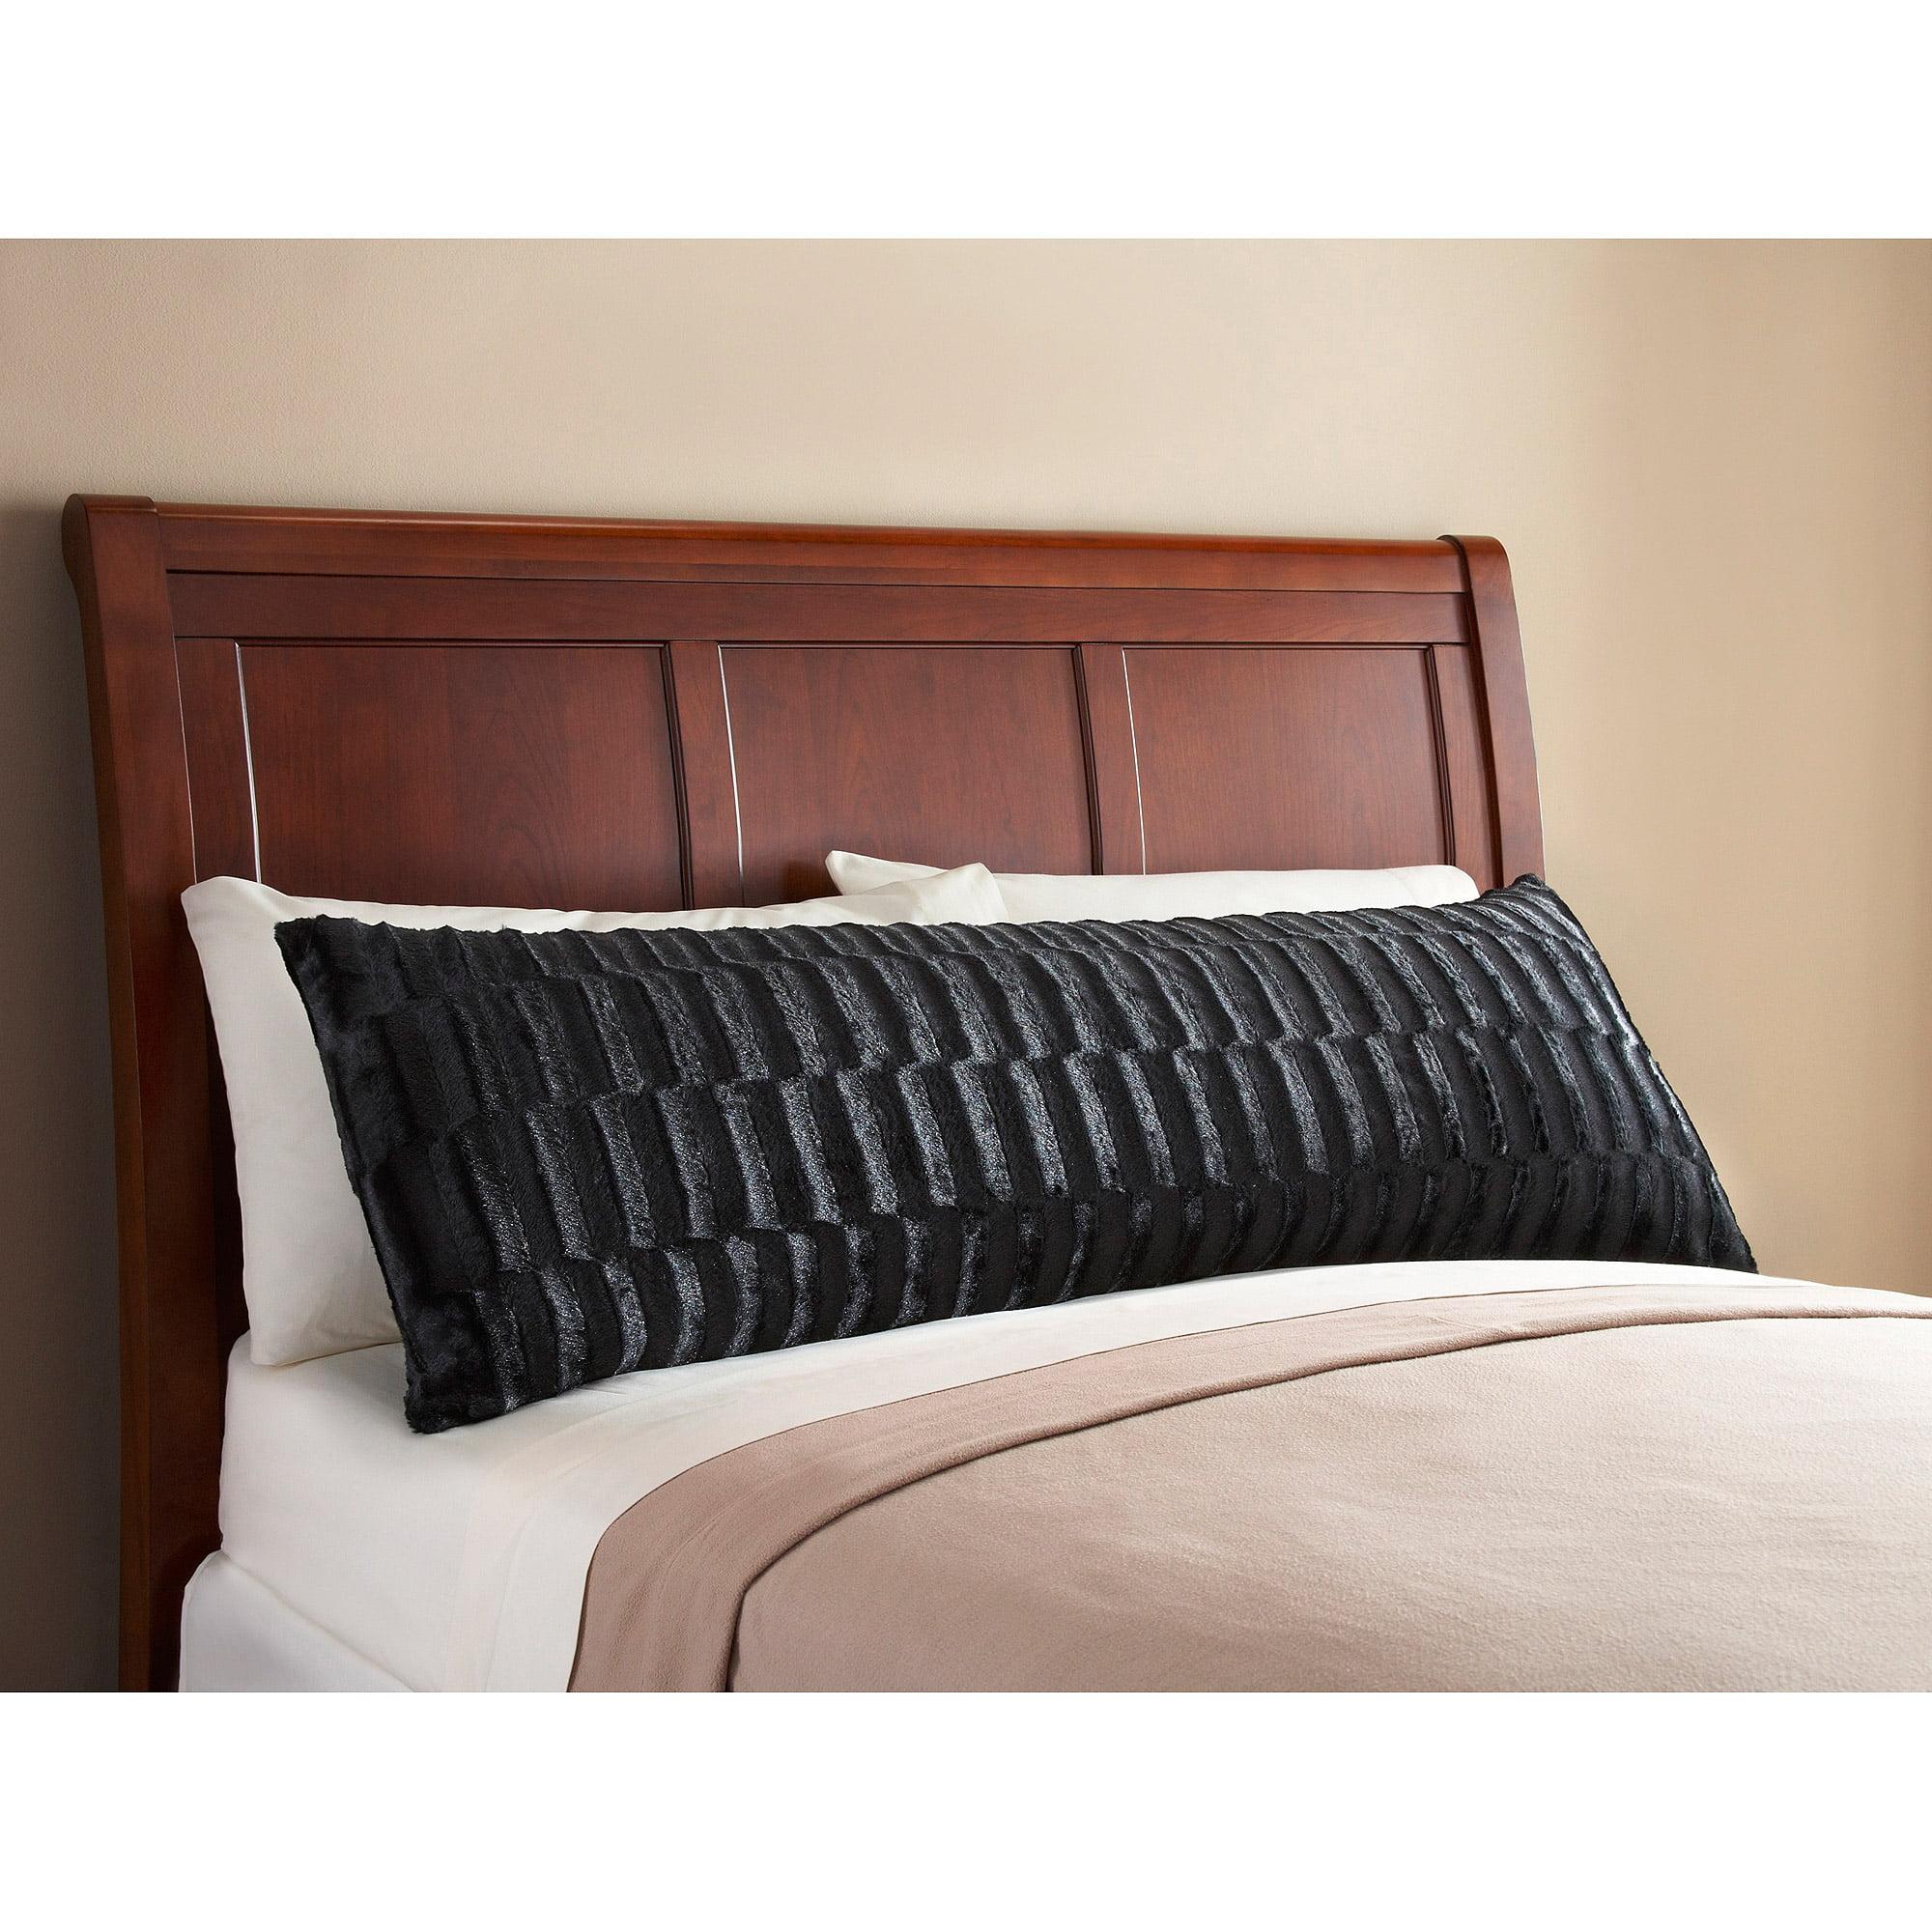 Mainstays Fur Body Pillow Cover Walmart